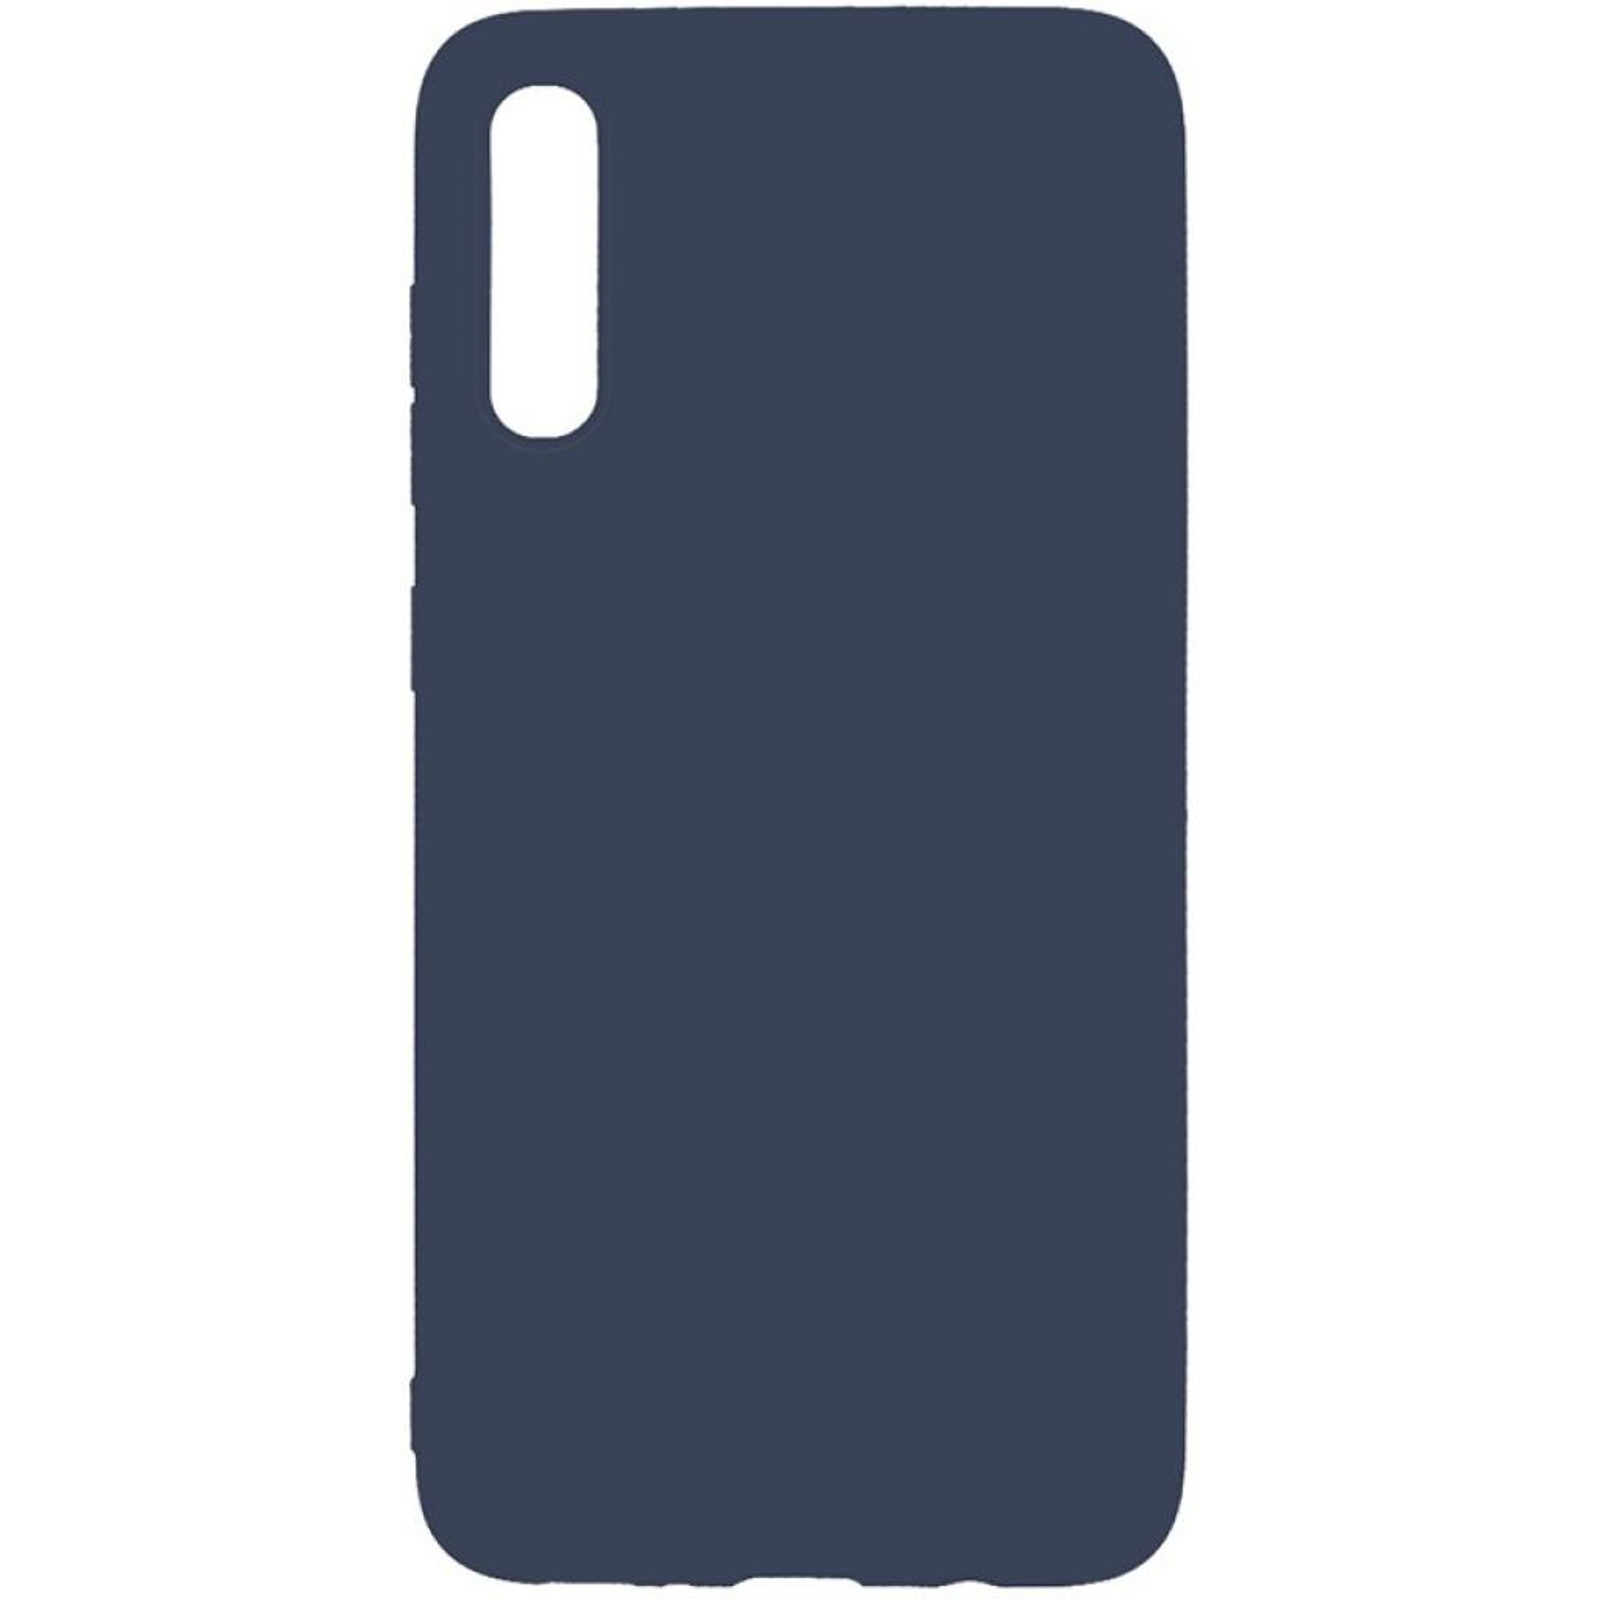 Чехол для моб. телефона Toto 1mm Matt TPU Case Samsung Galaxy A70 2019 Navy Blue (F_94074)